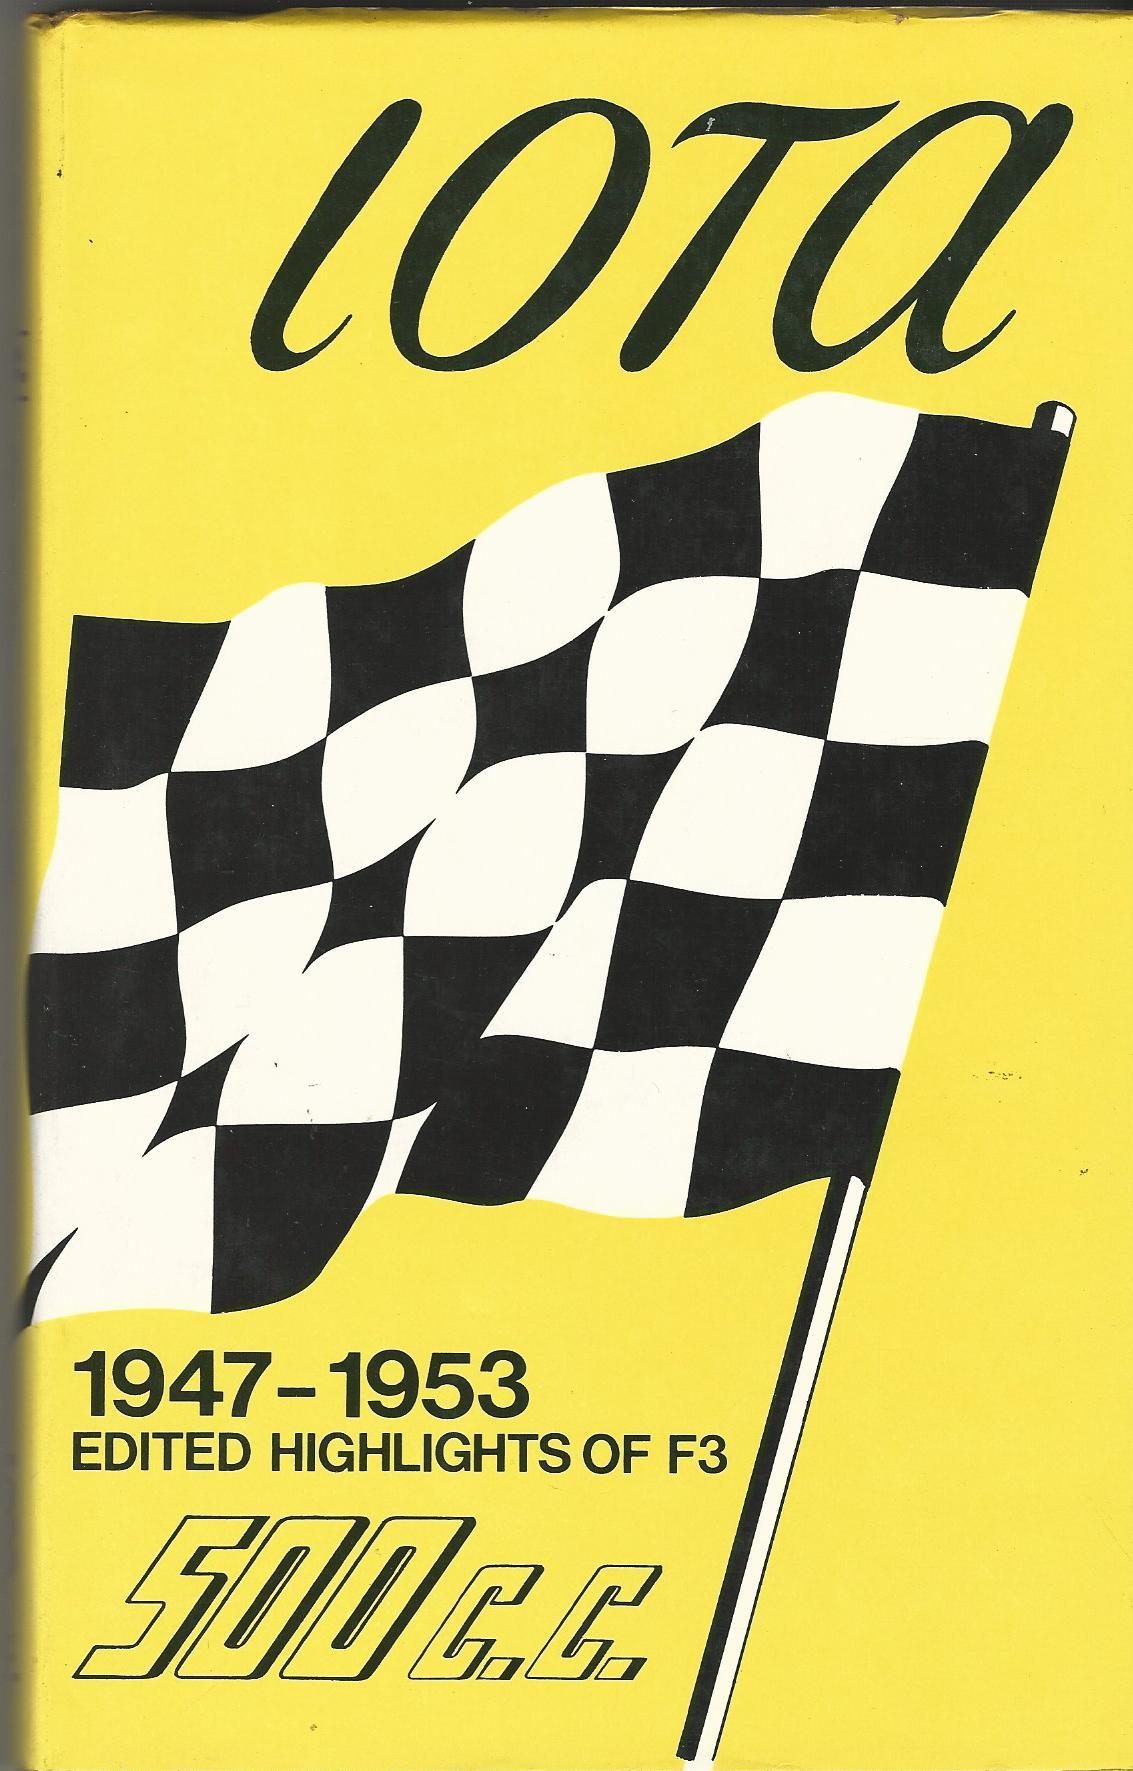 Iota 500c.c. Racing, 1947-53